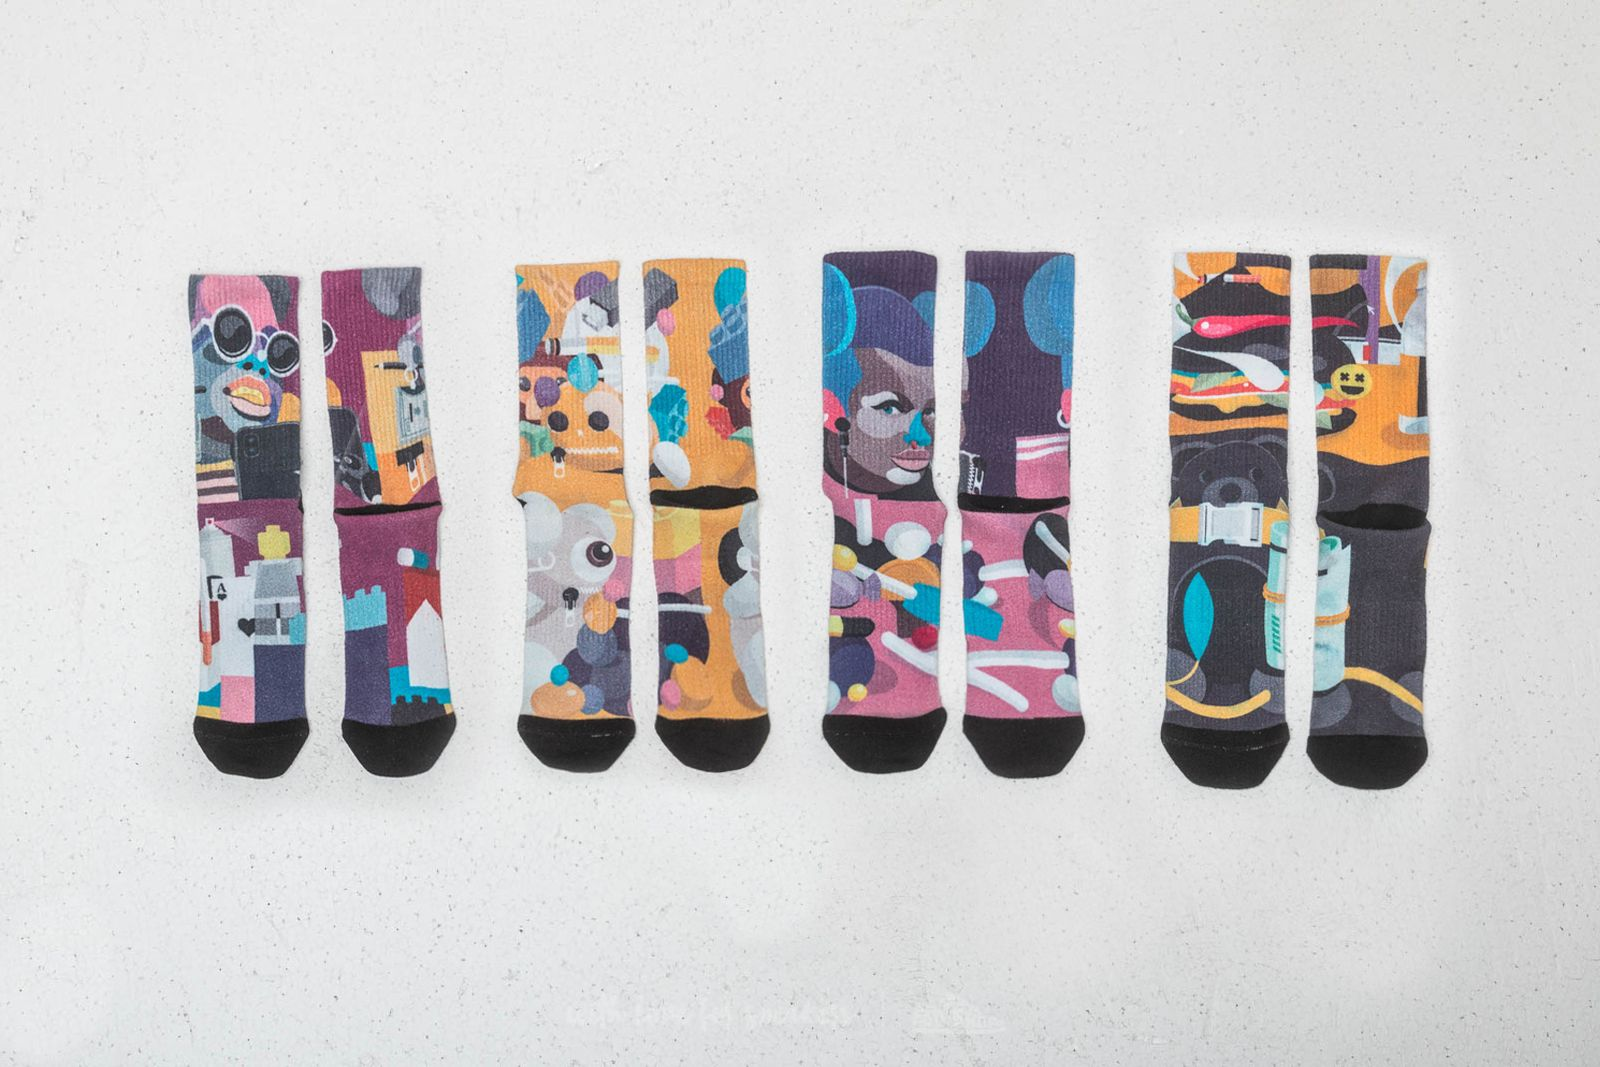 Socks Moon Socks x Marek Mraz Deluxe Pack Socks